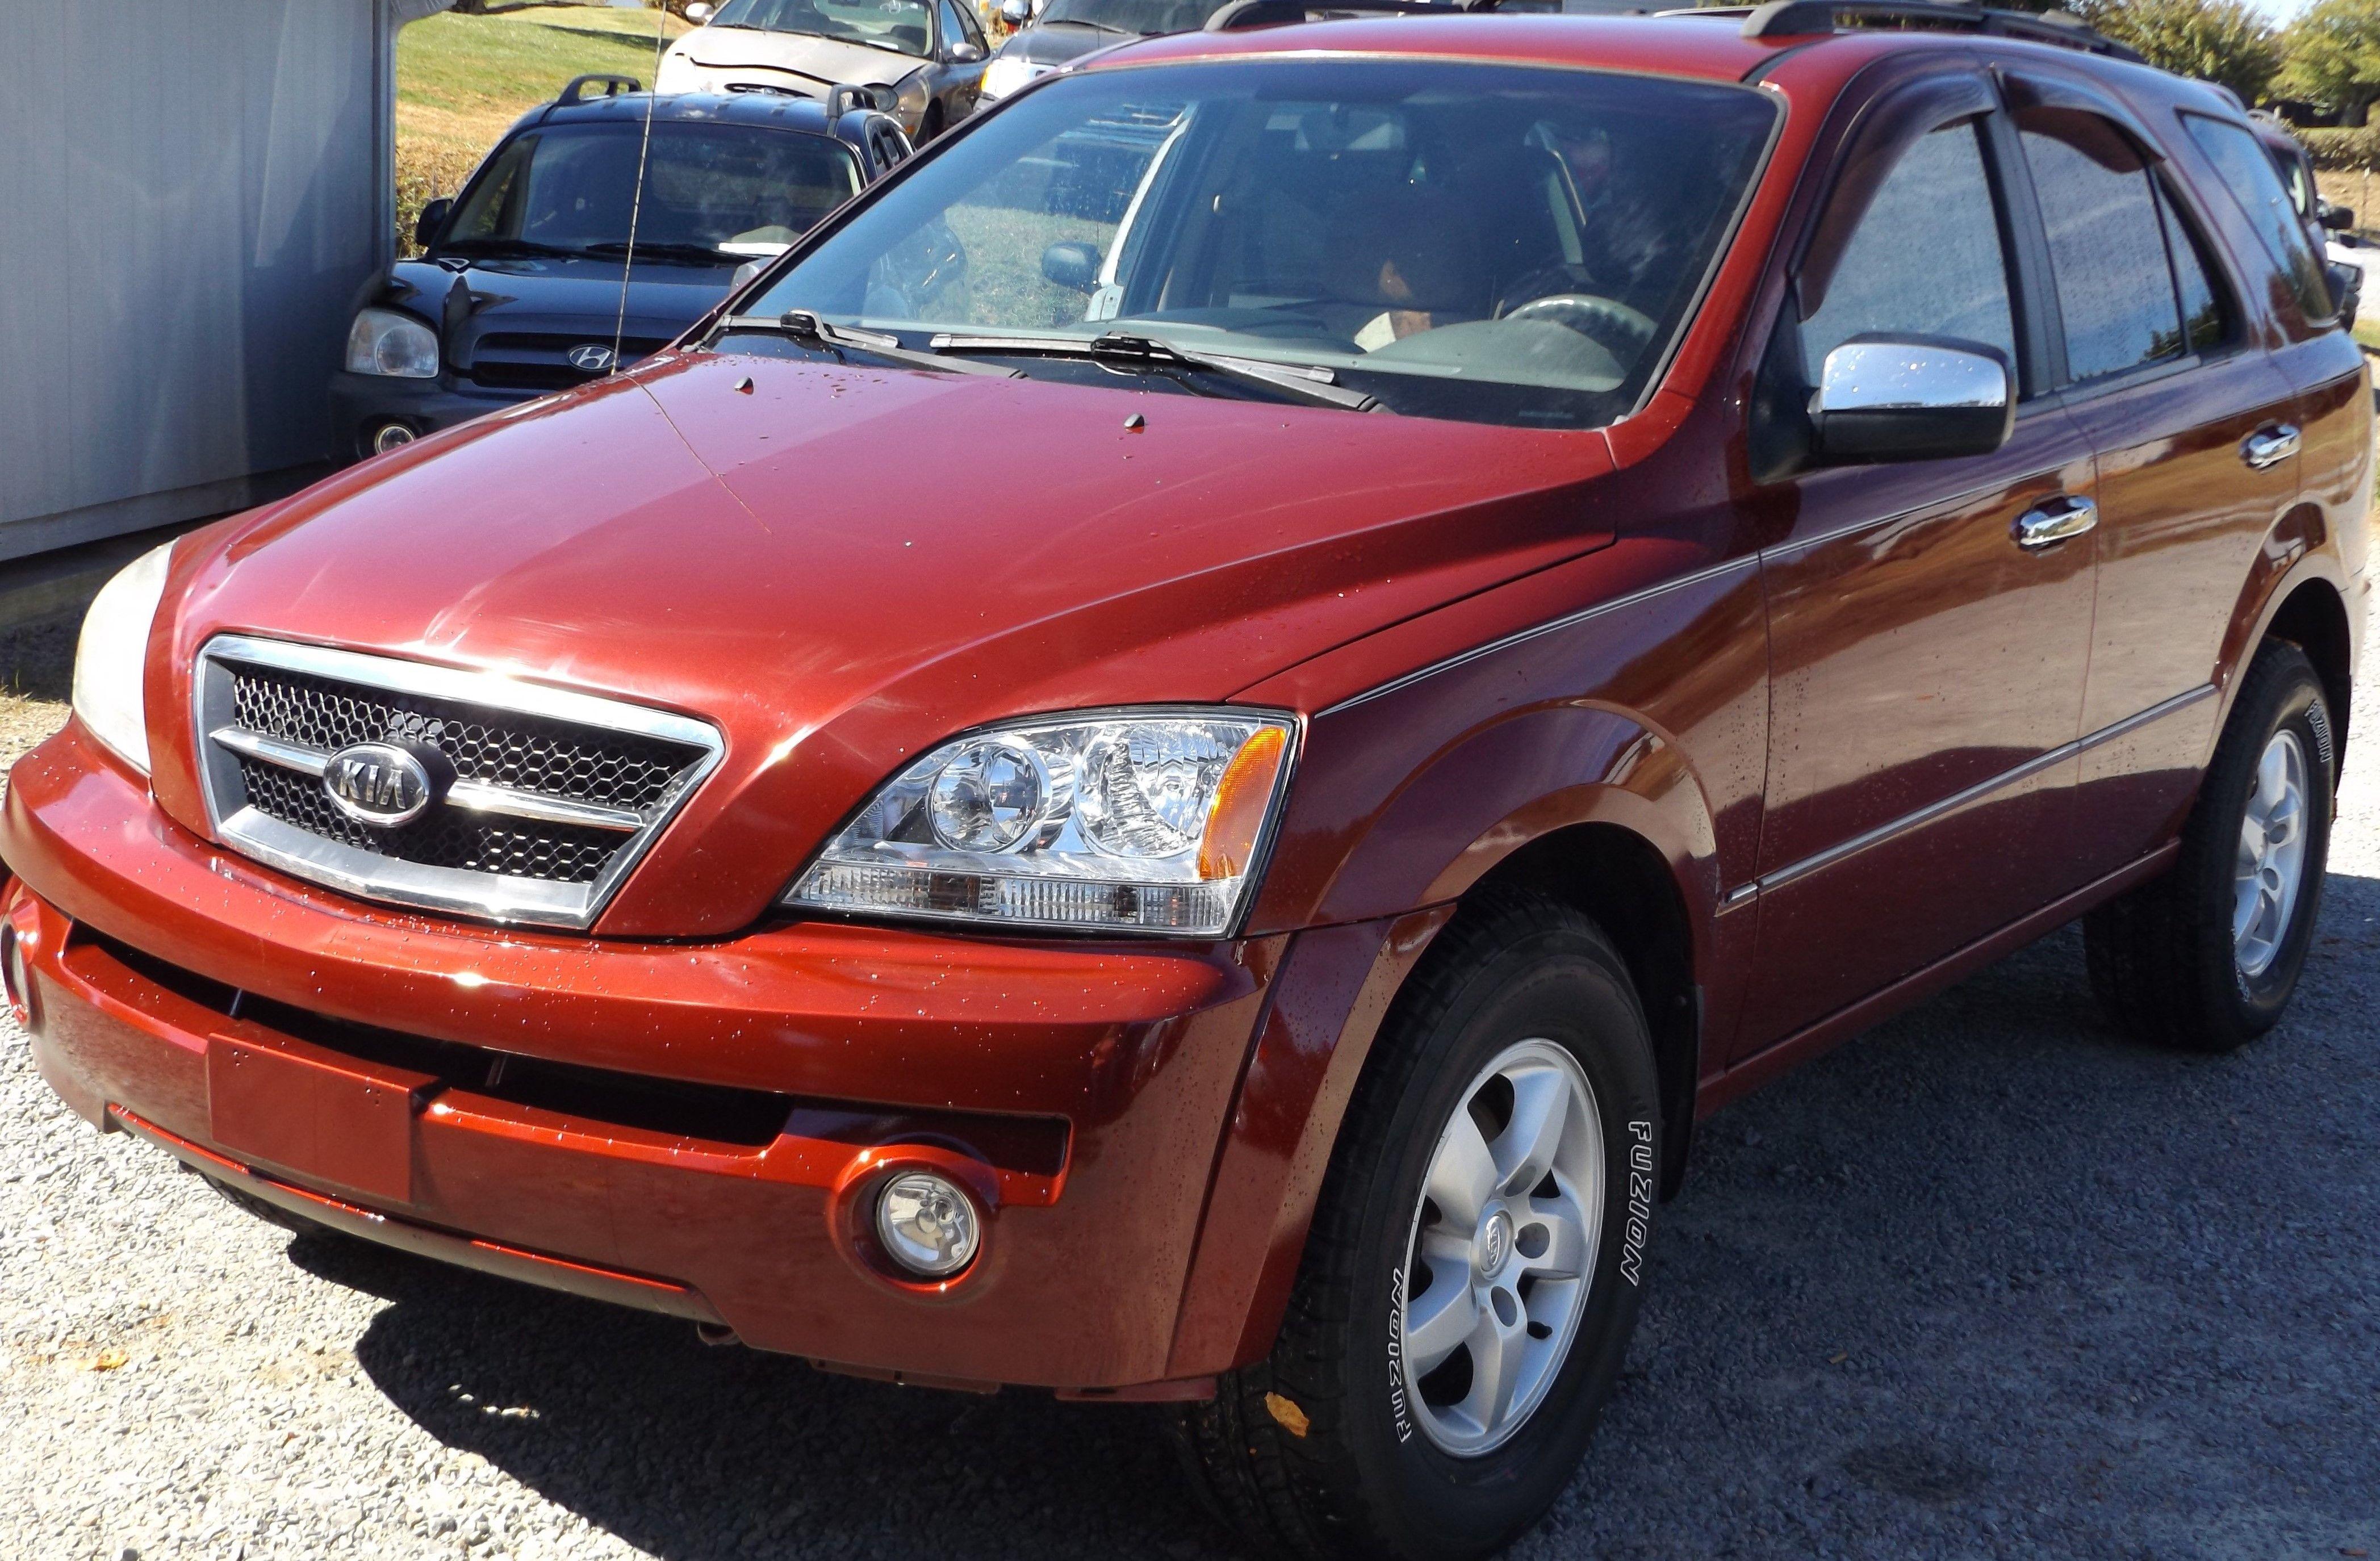 hatchback for kia specs za sa motoring cerato co news sale prices and cars